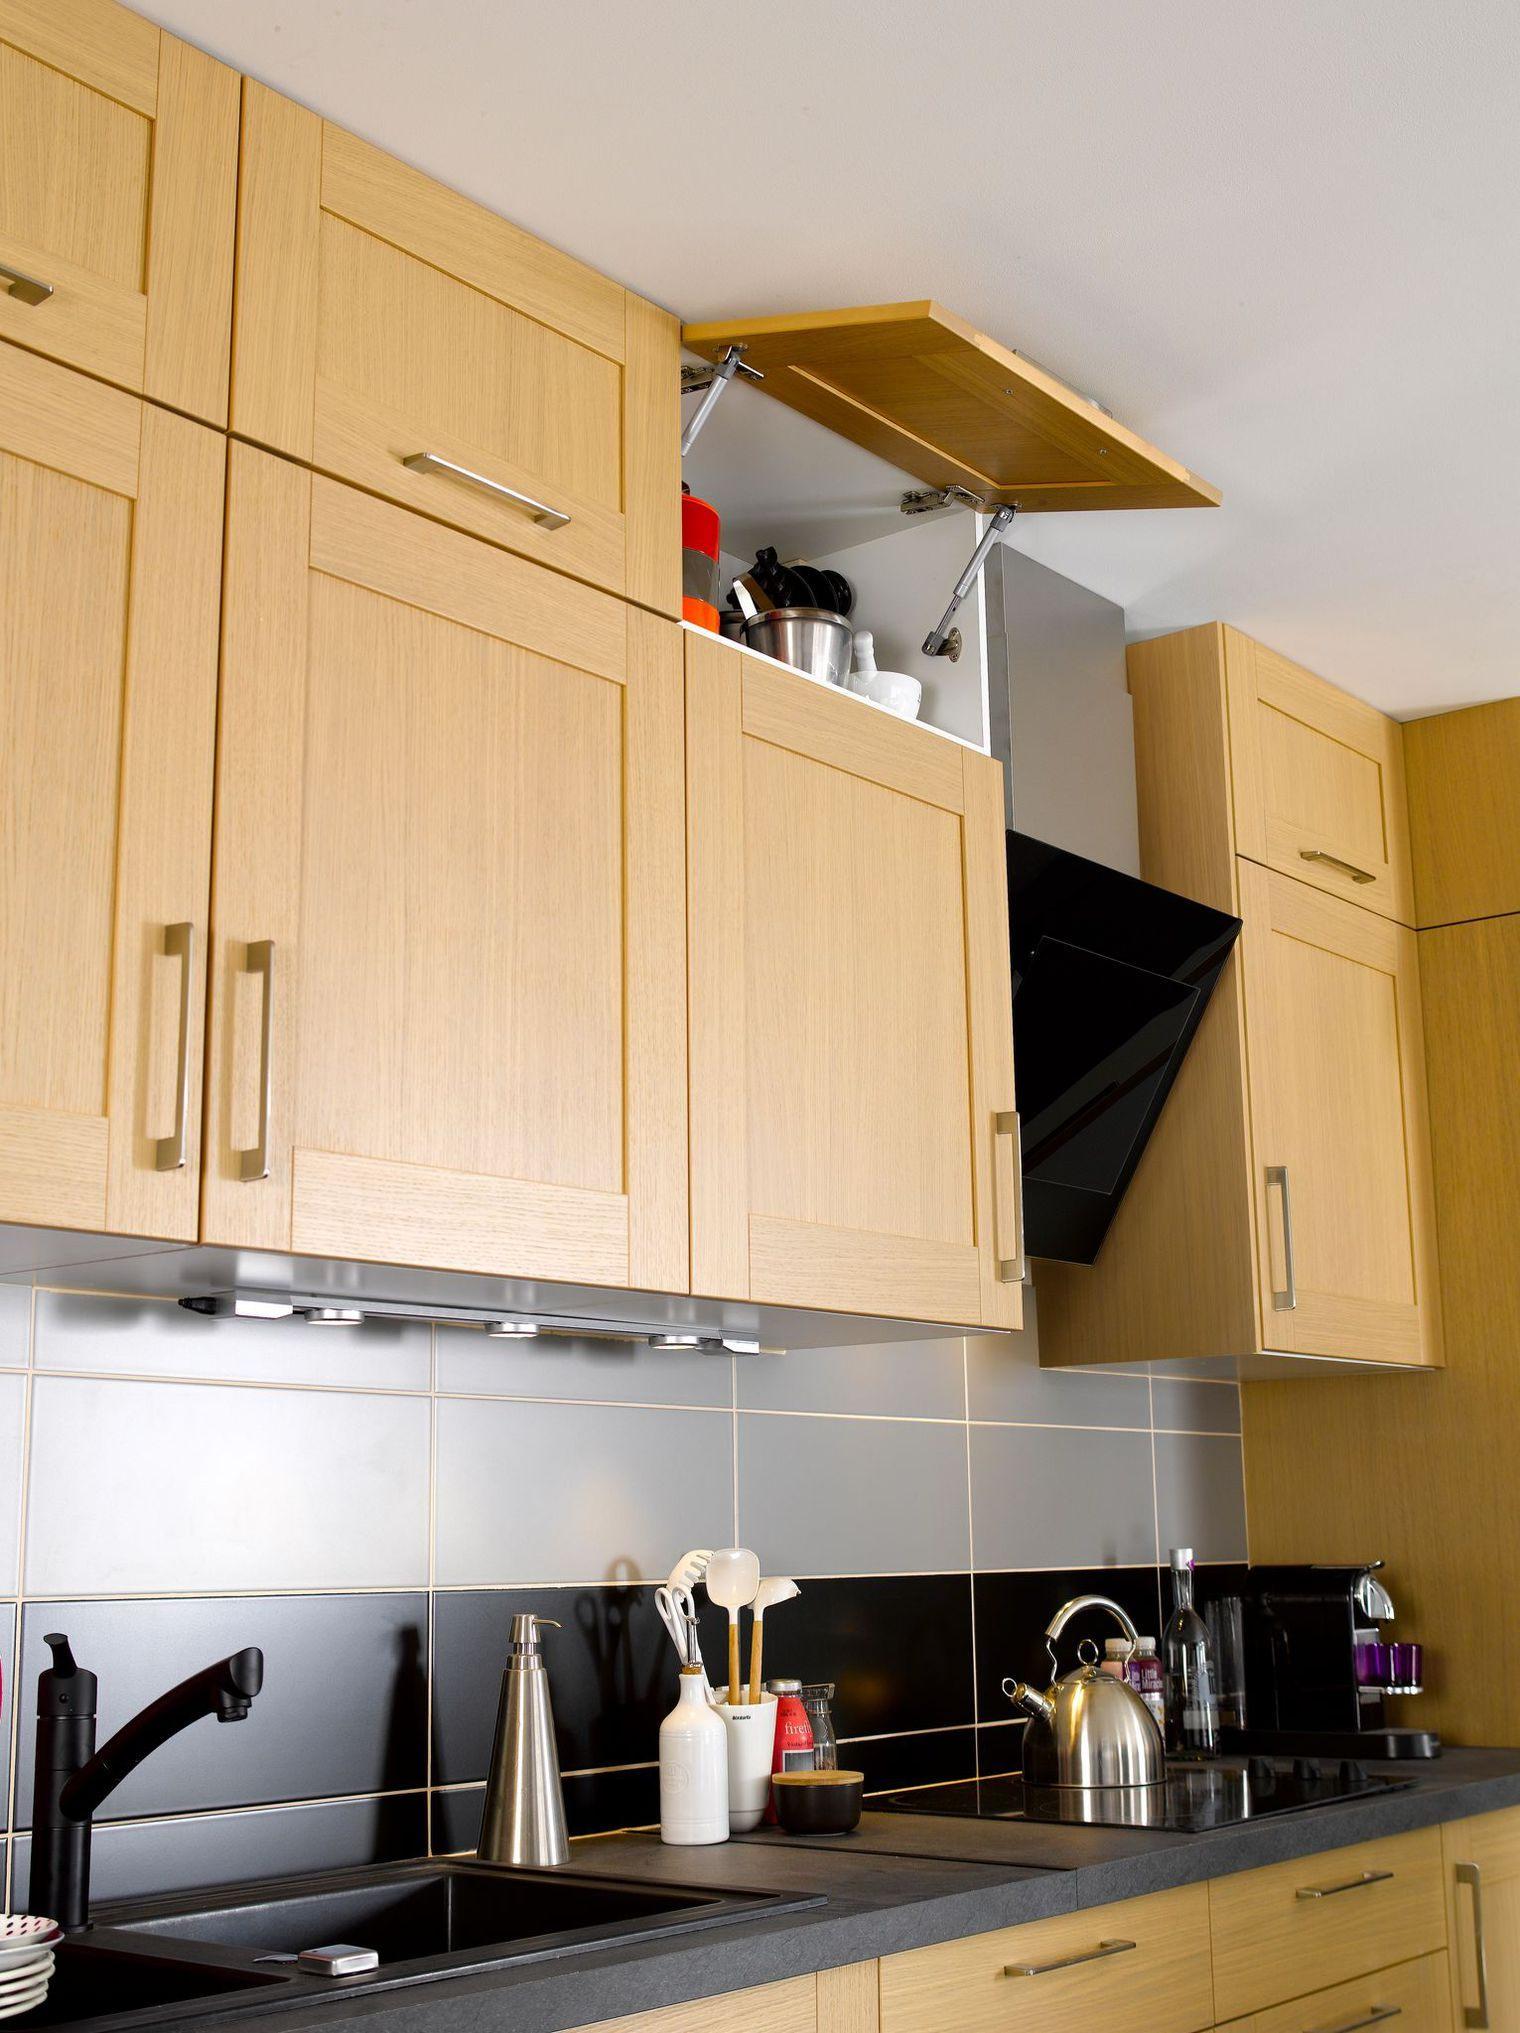 verin porte cuisine leroy merlin l gant photos porte. Black Bedroom Furniture Sets. Home Design Ideas